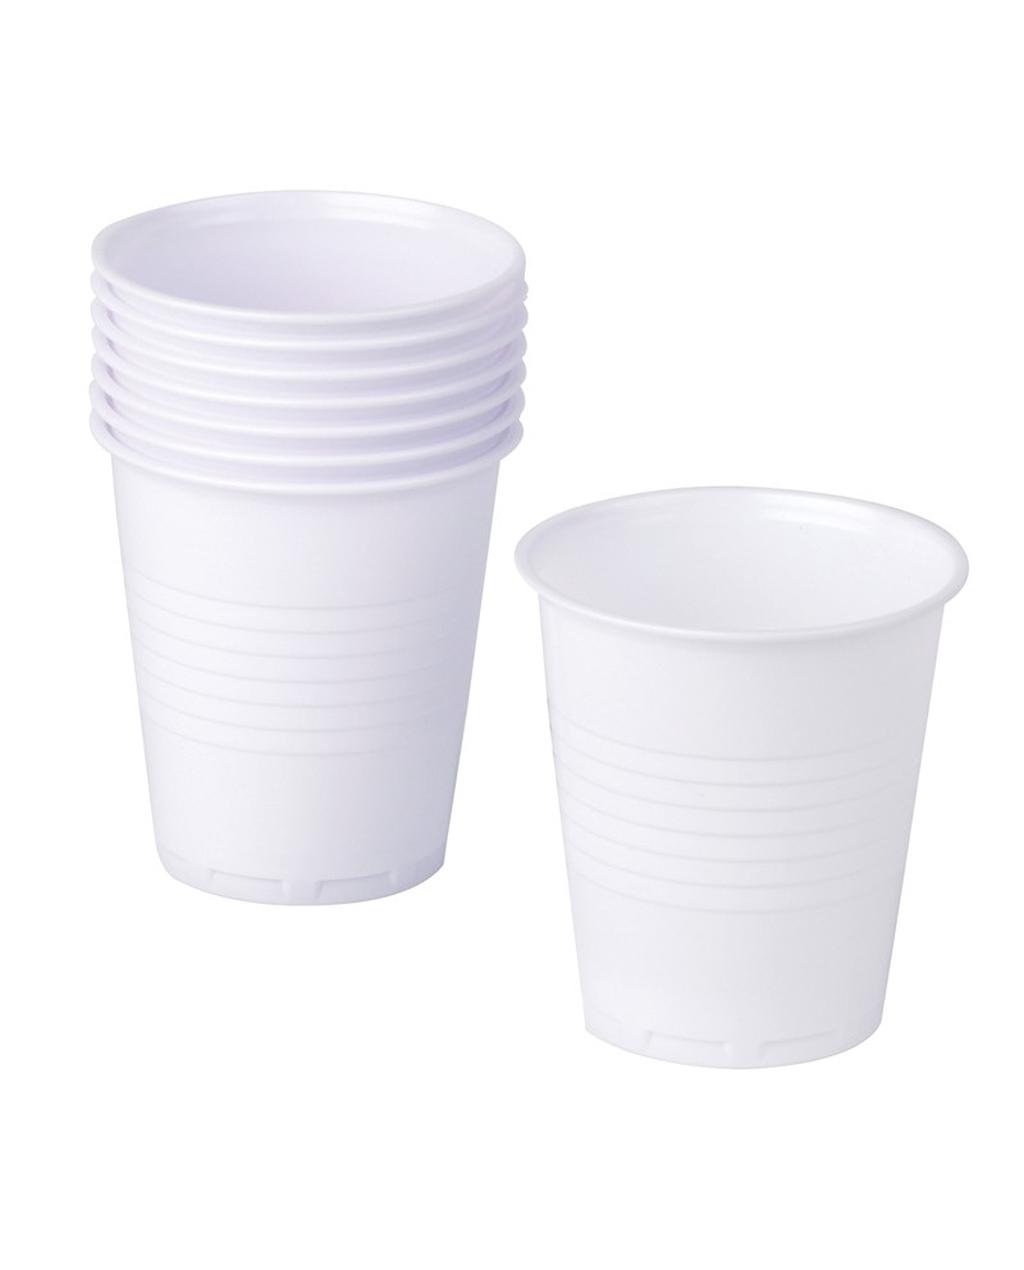 7oz Squat Plastic Cups - For Vending Machines